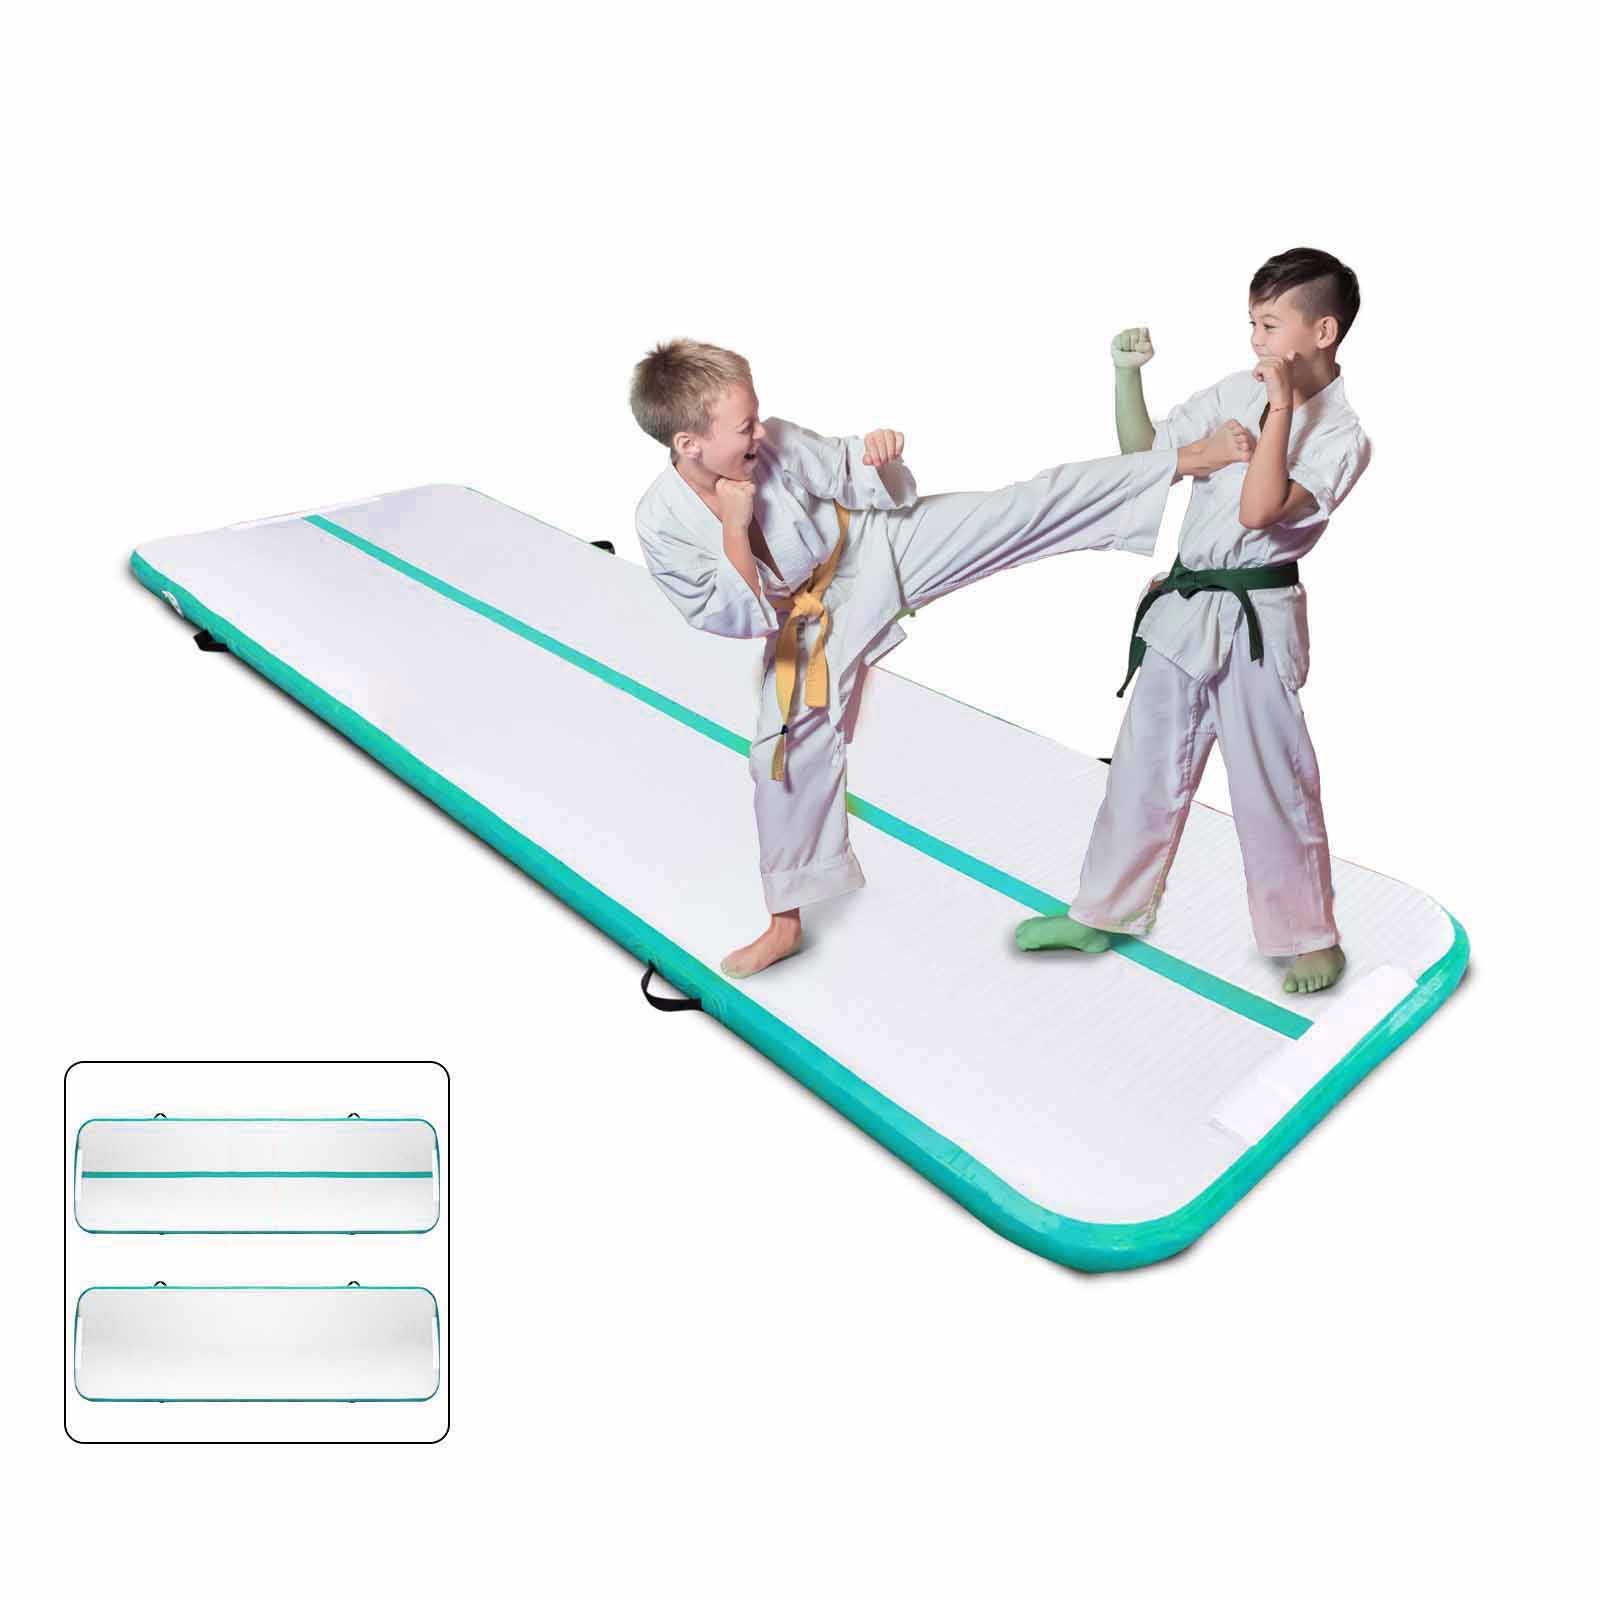 Air-Track-10x3FT-Trumbling-Airtrack-Gymnastics-Yoga-Floor-Mat-Training-Pad-Home thumbnail 83